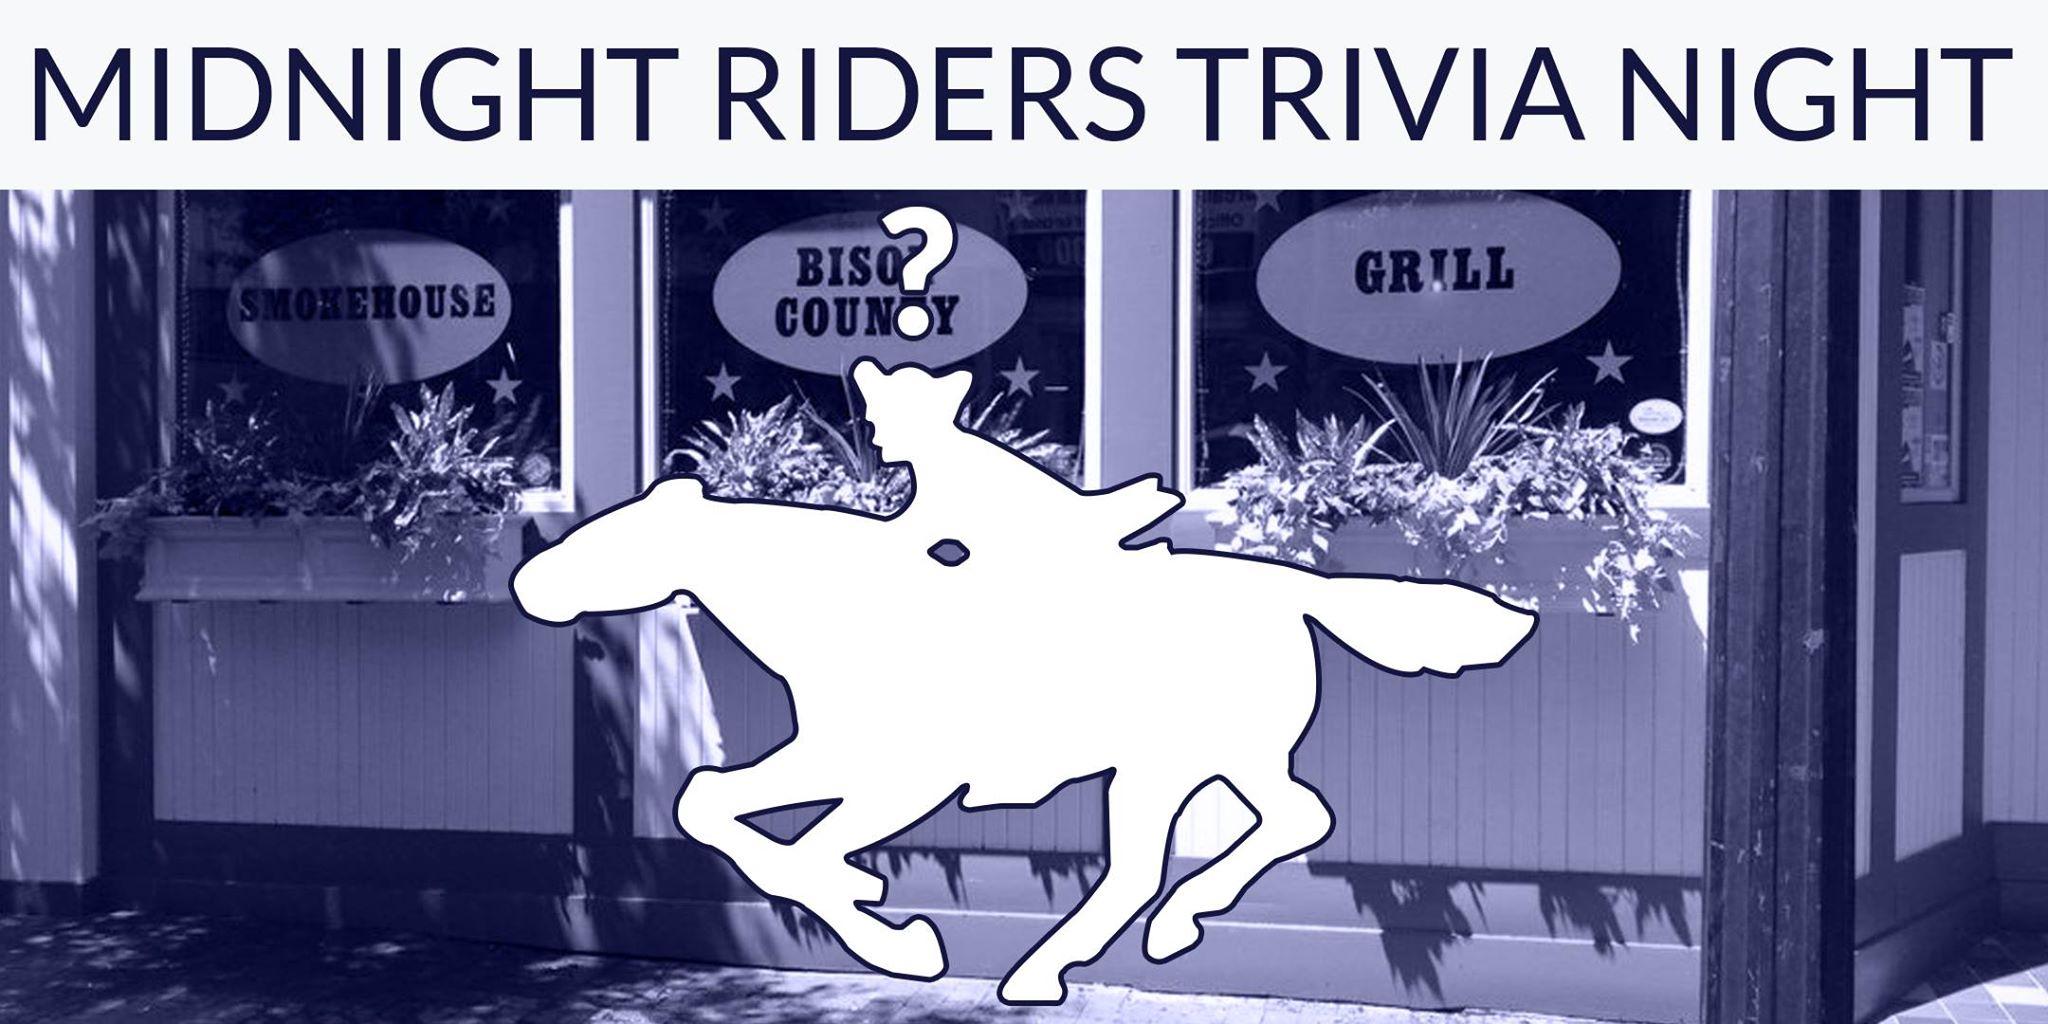 Bison County Trivia Night